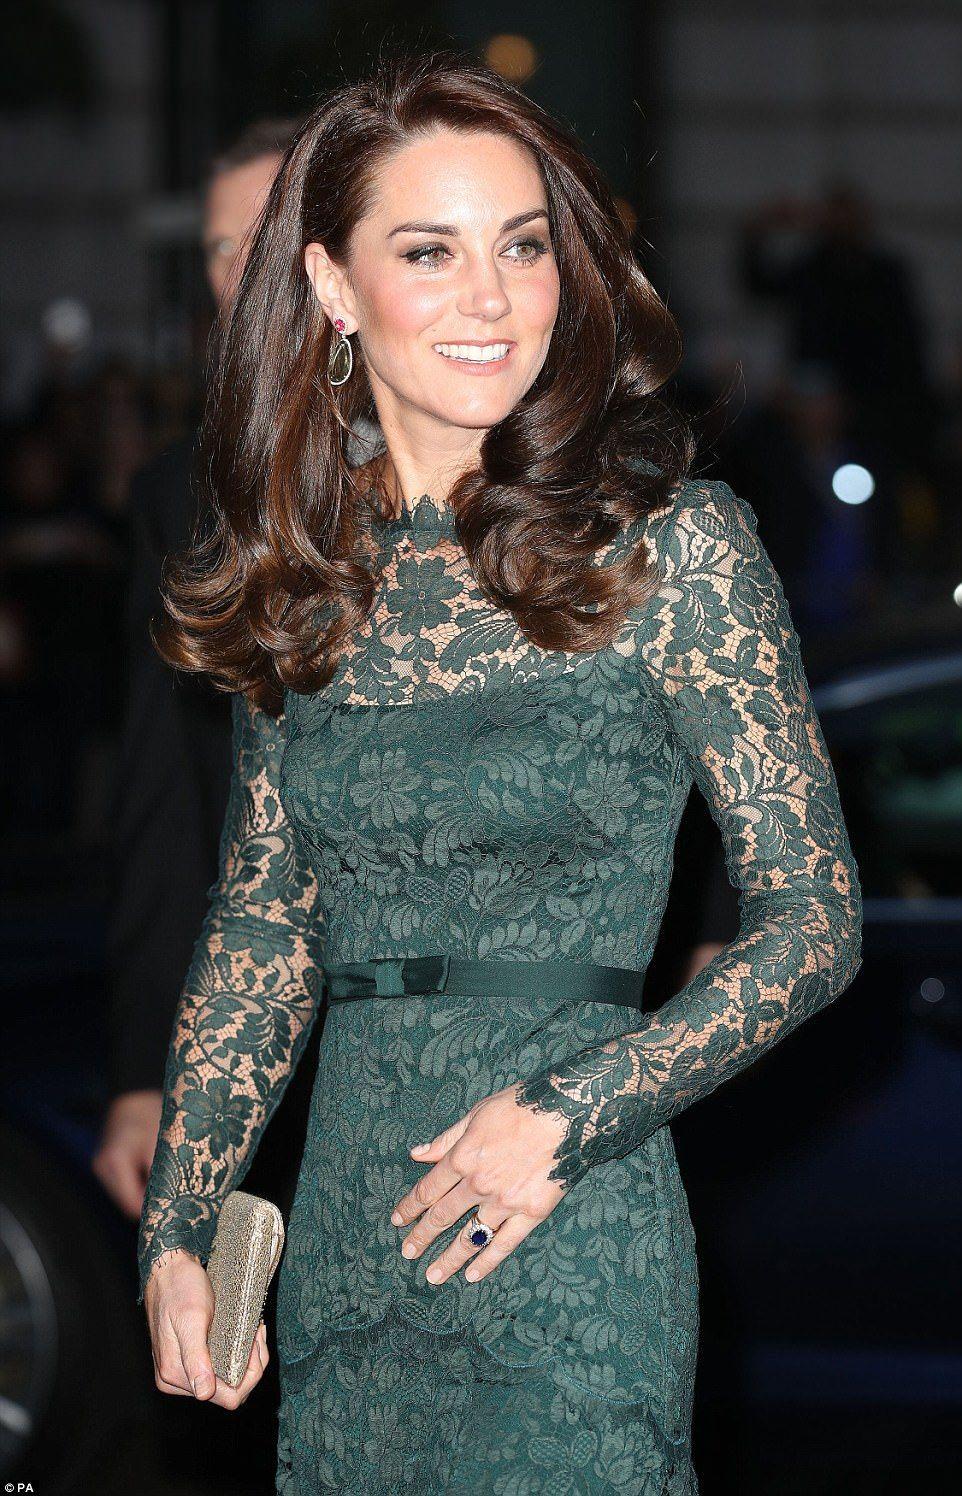 Lace dress kate middleton    Kate Middleton  Pinterest  Kate middleton Cambridge and